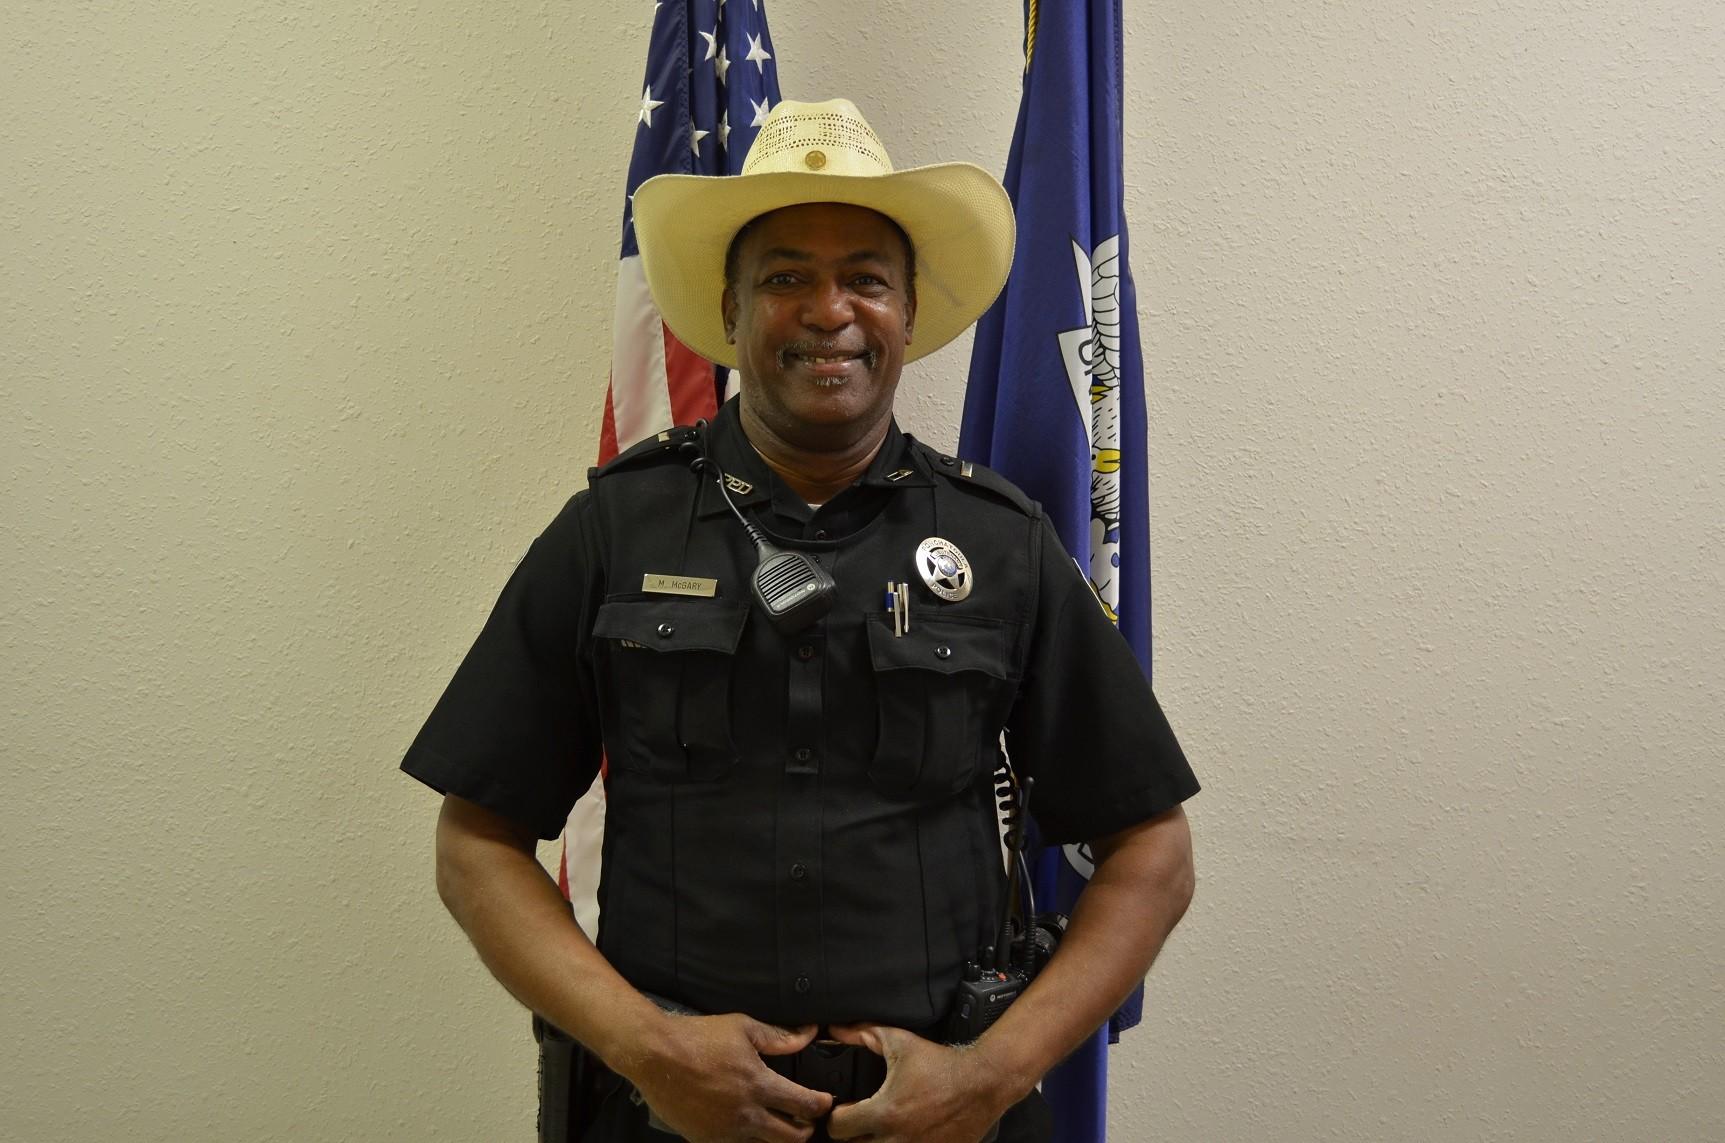 Capt. Melvin McGary